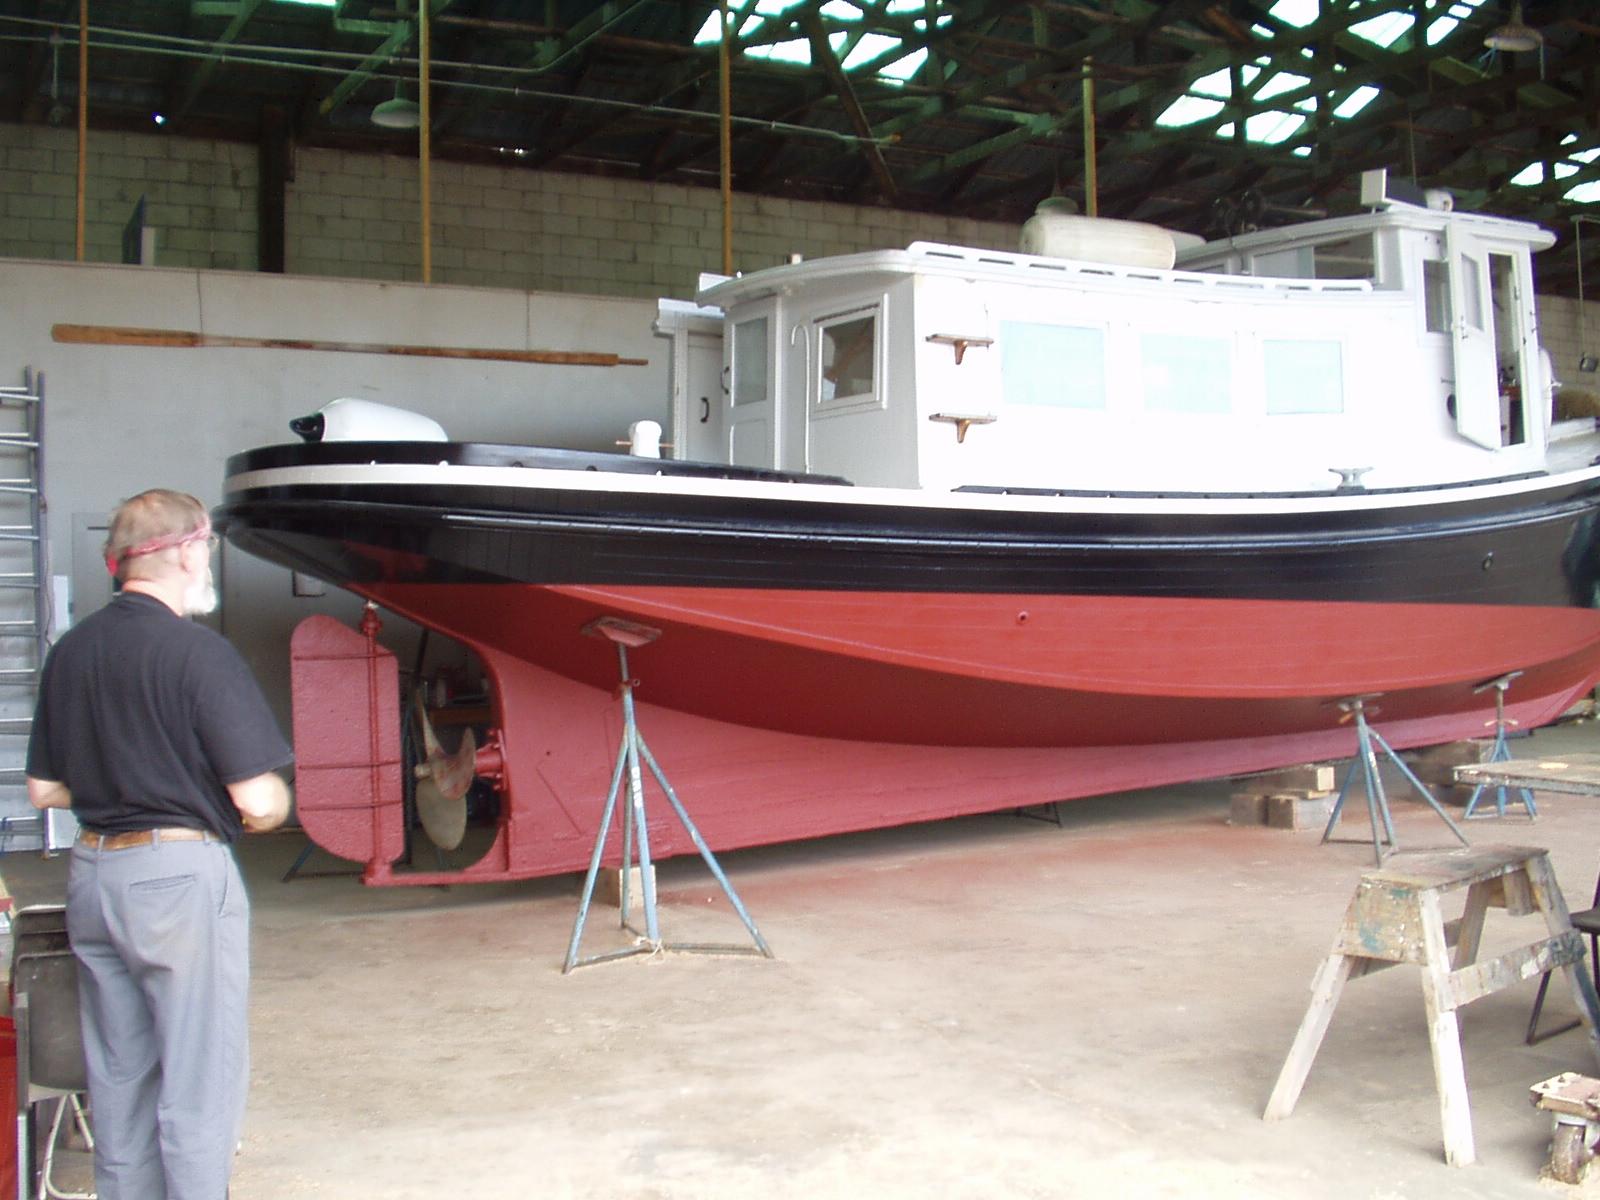 Tug boat restoration - paint job complete